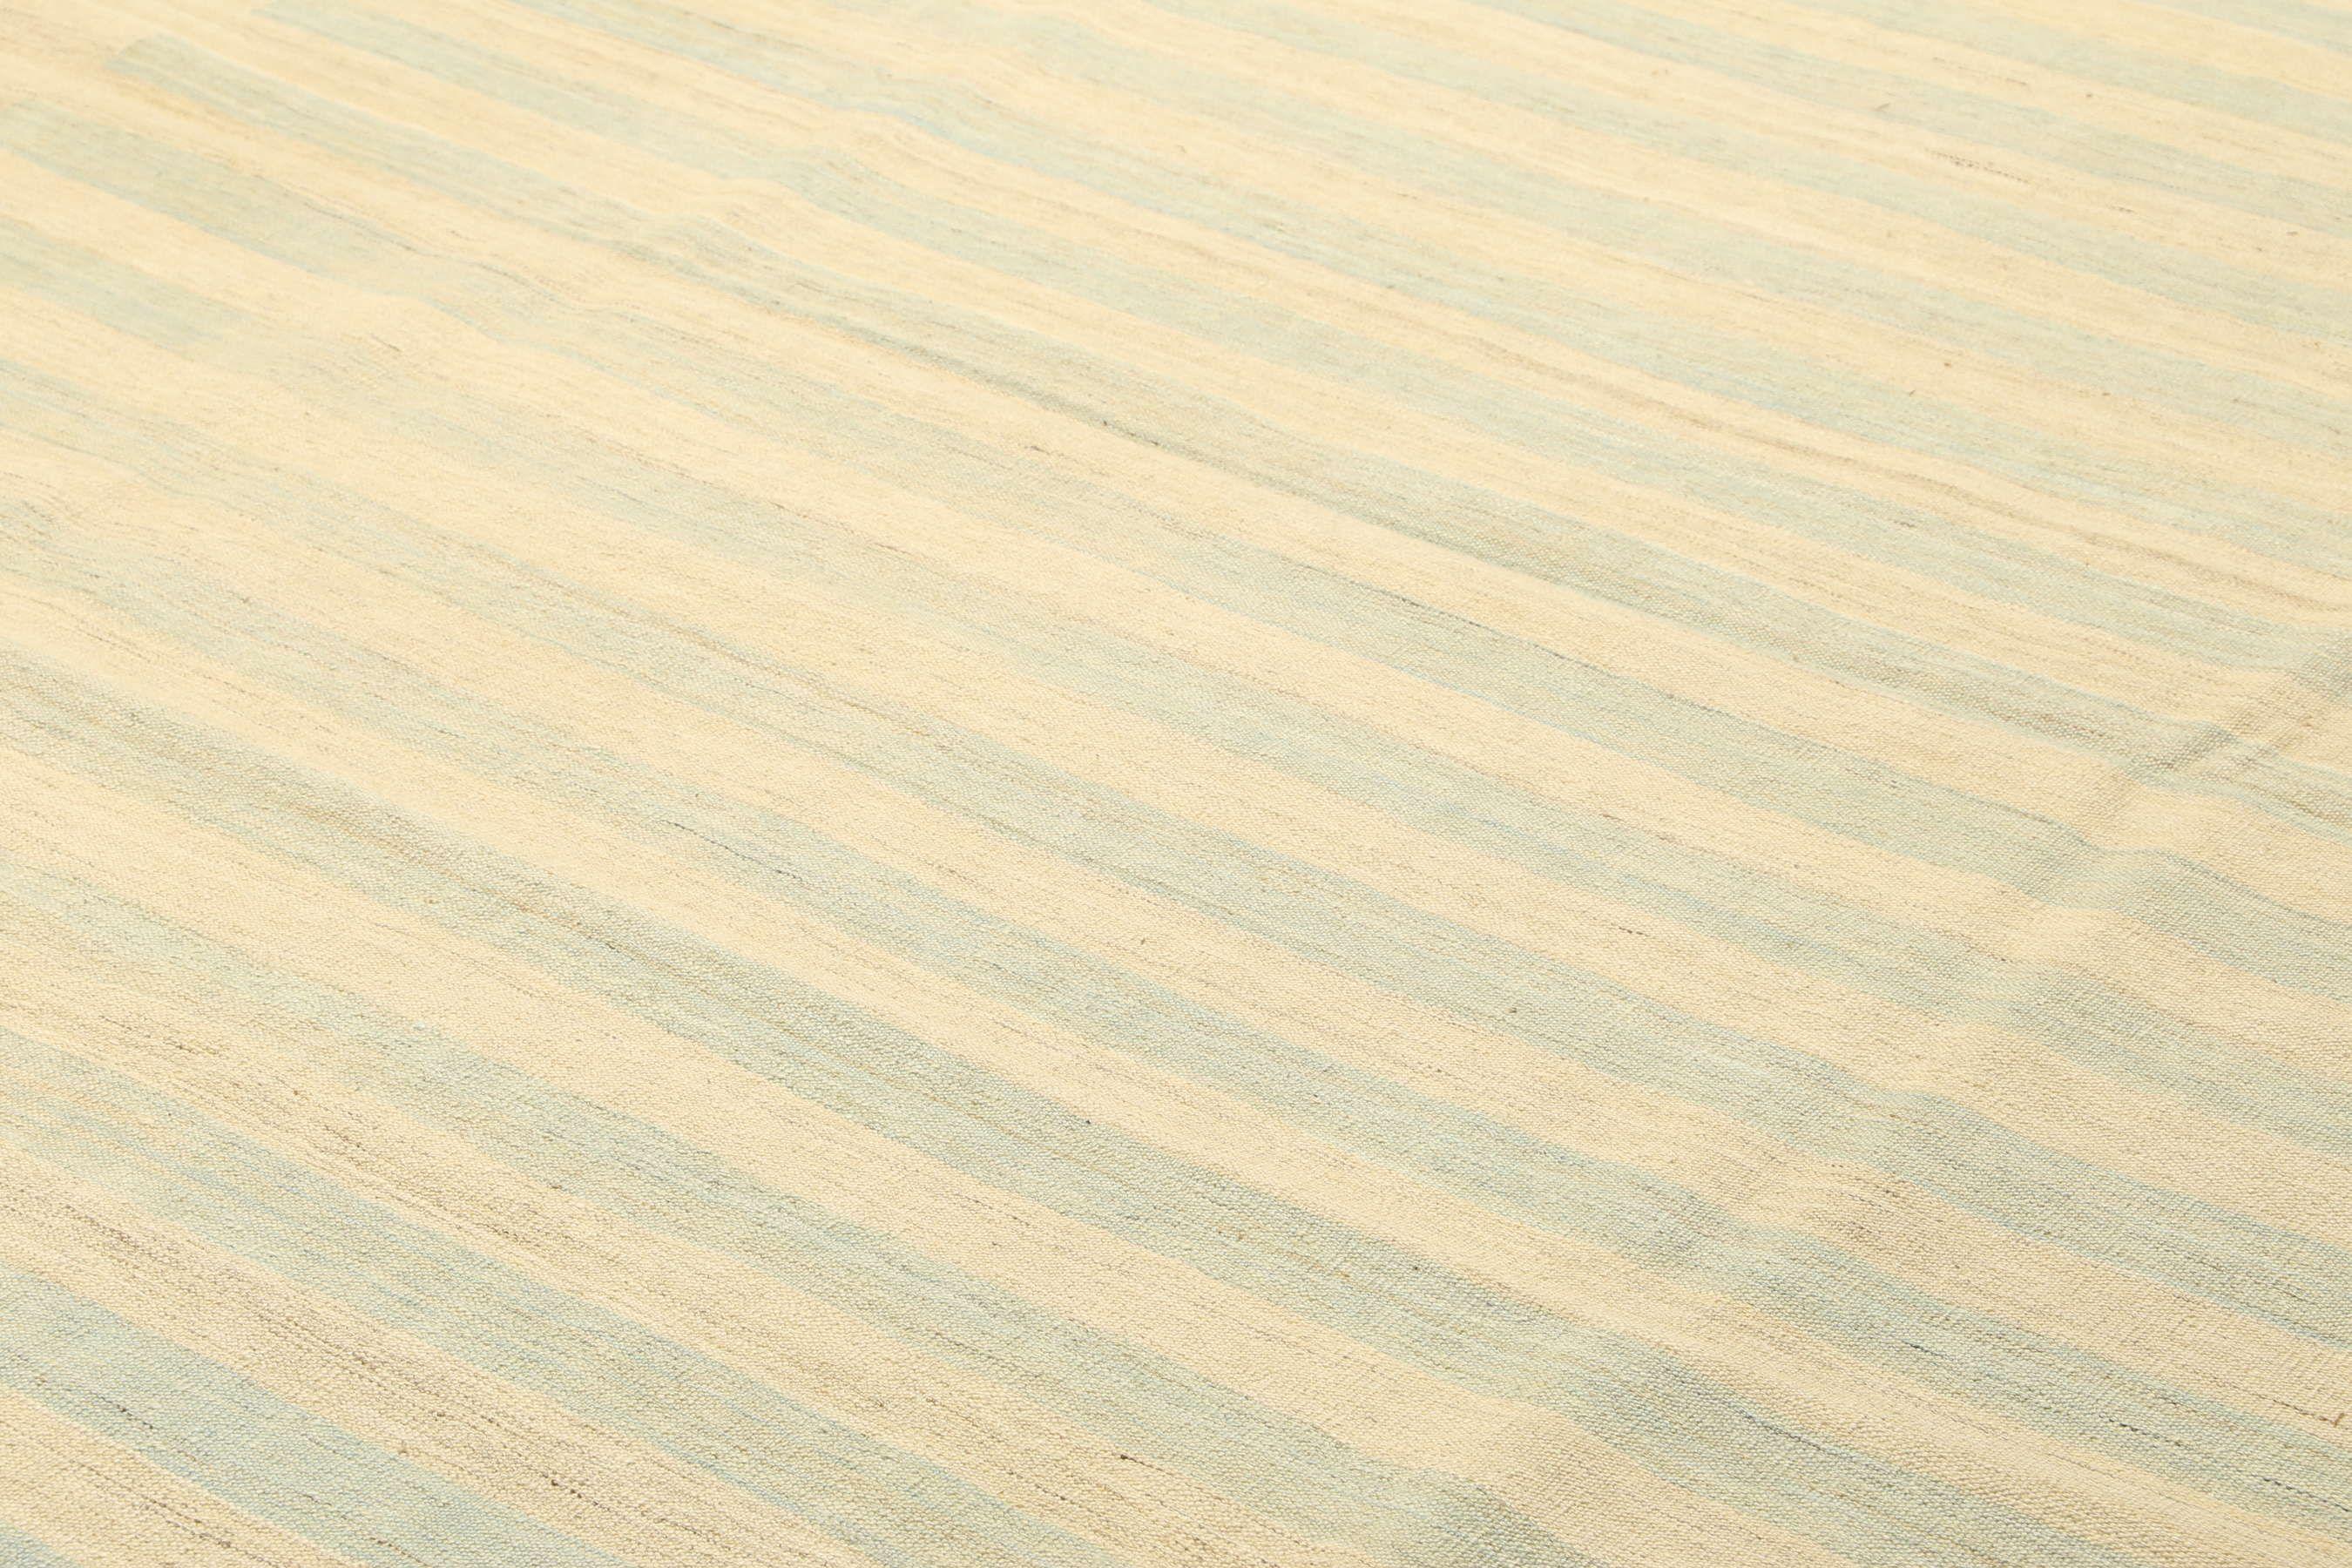 Tappeti Kilim Moderni : Tappeto kilim antico design geometrico